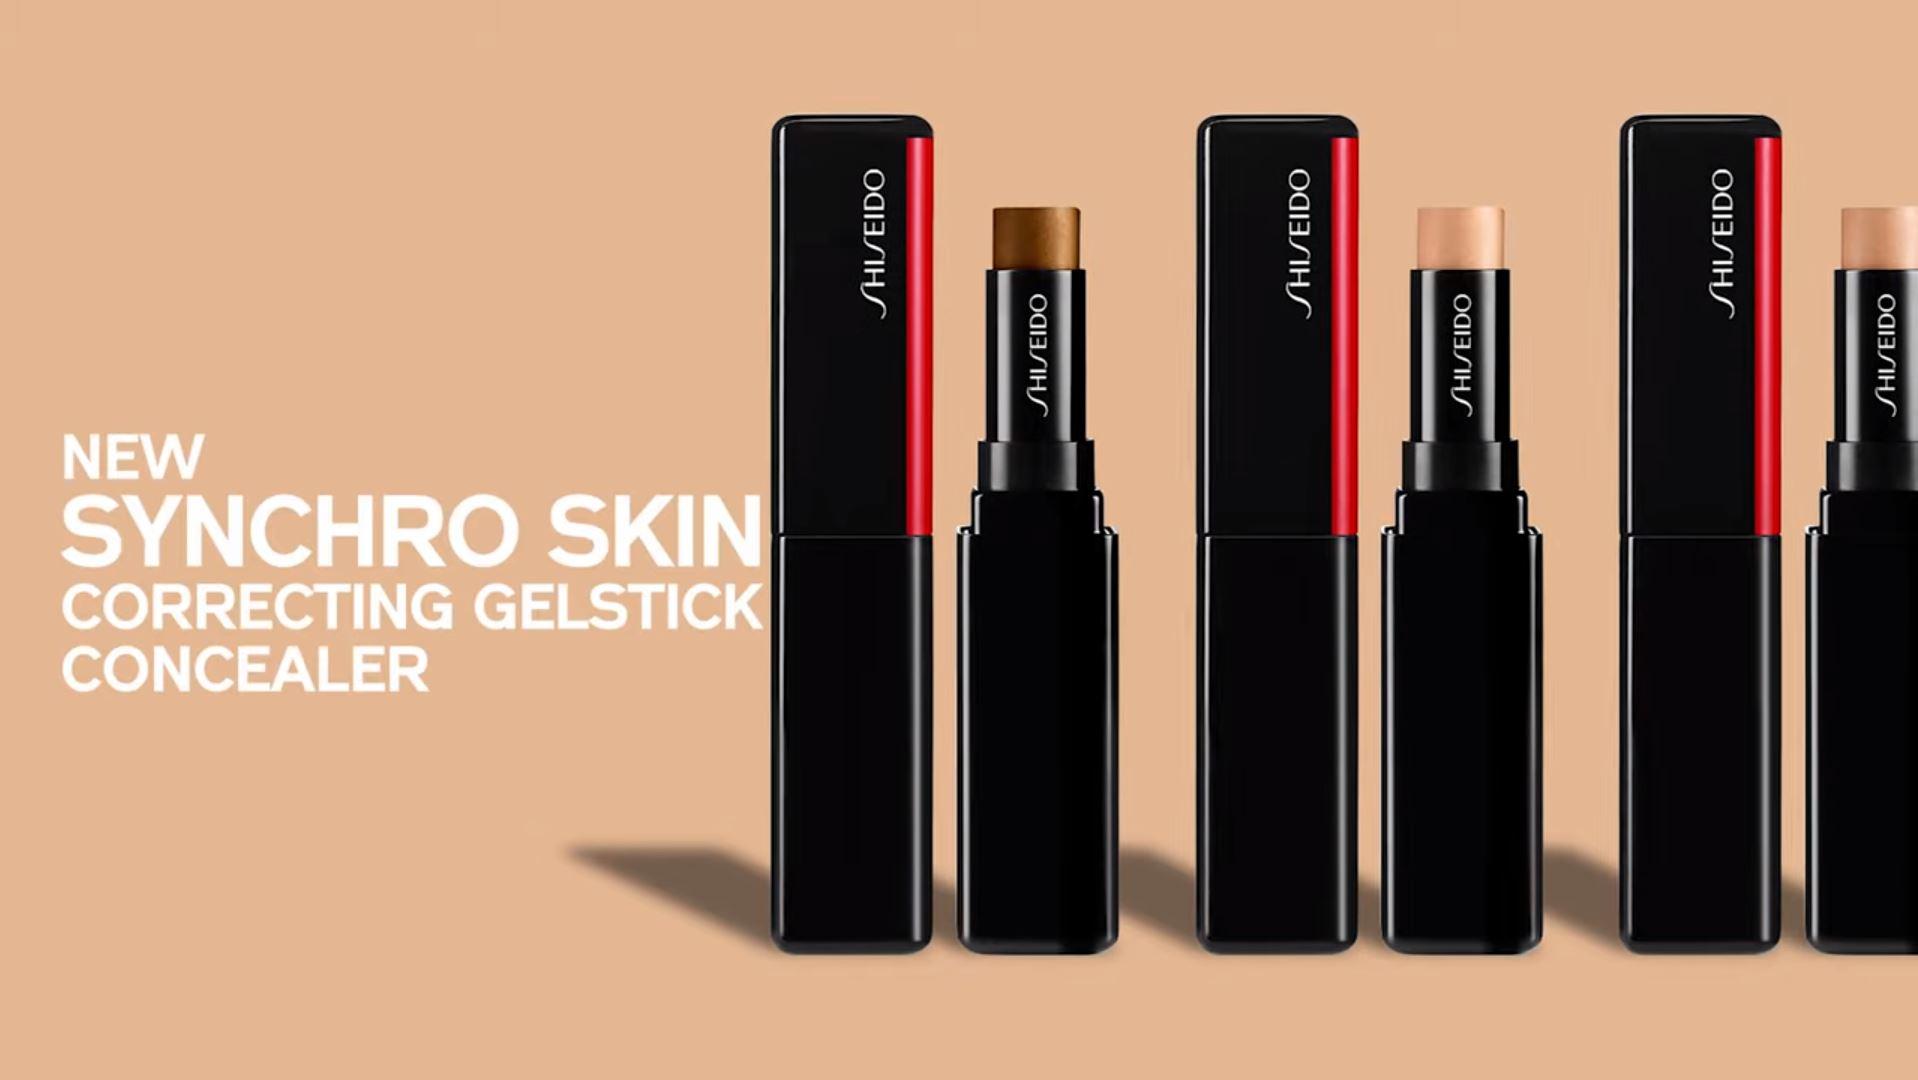 Synchro Skin Self-Refreshing GelStick Concealer